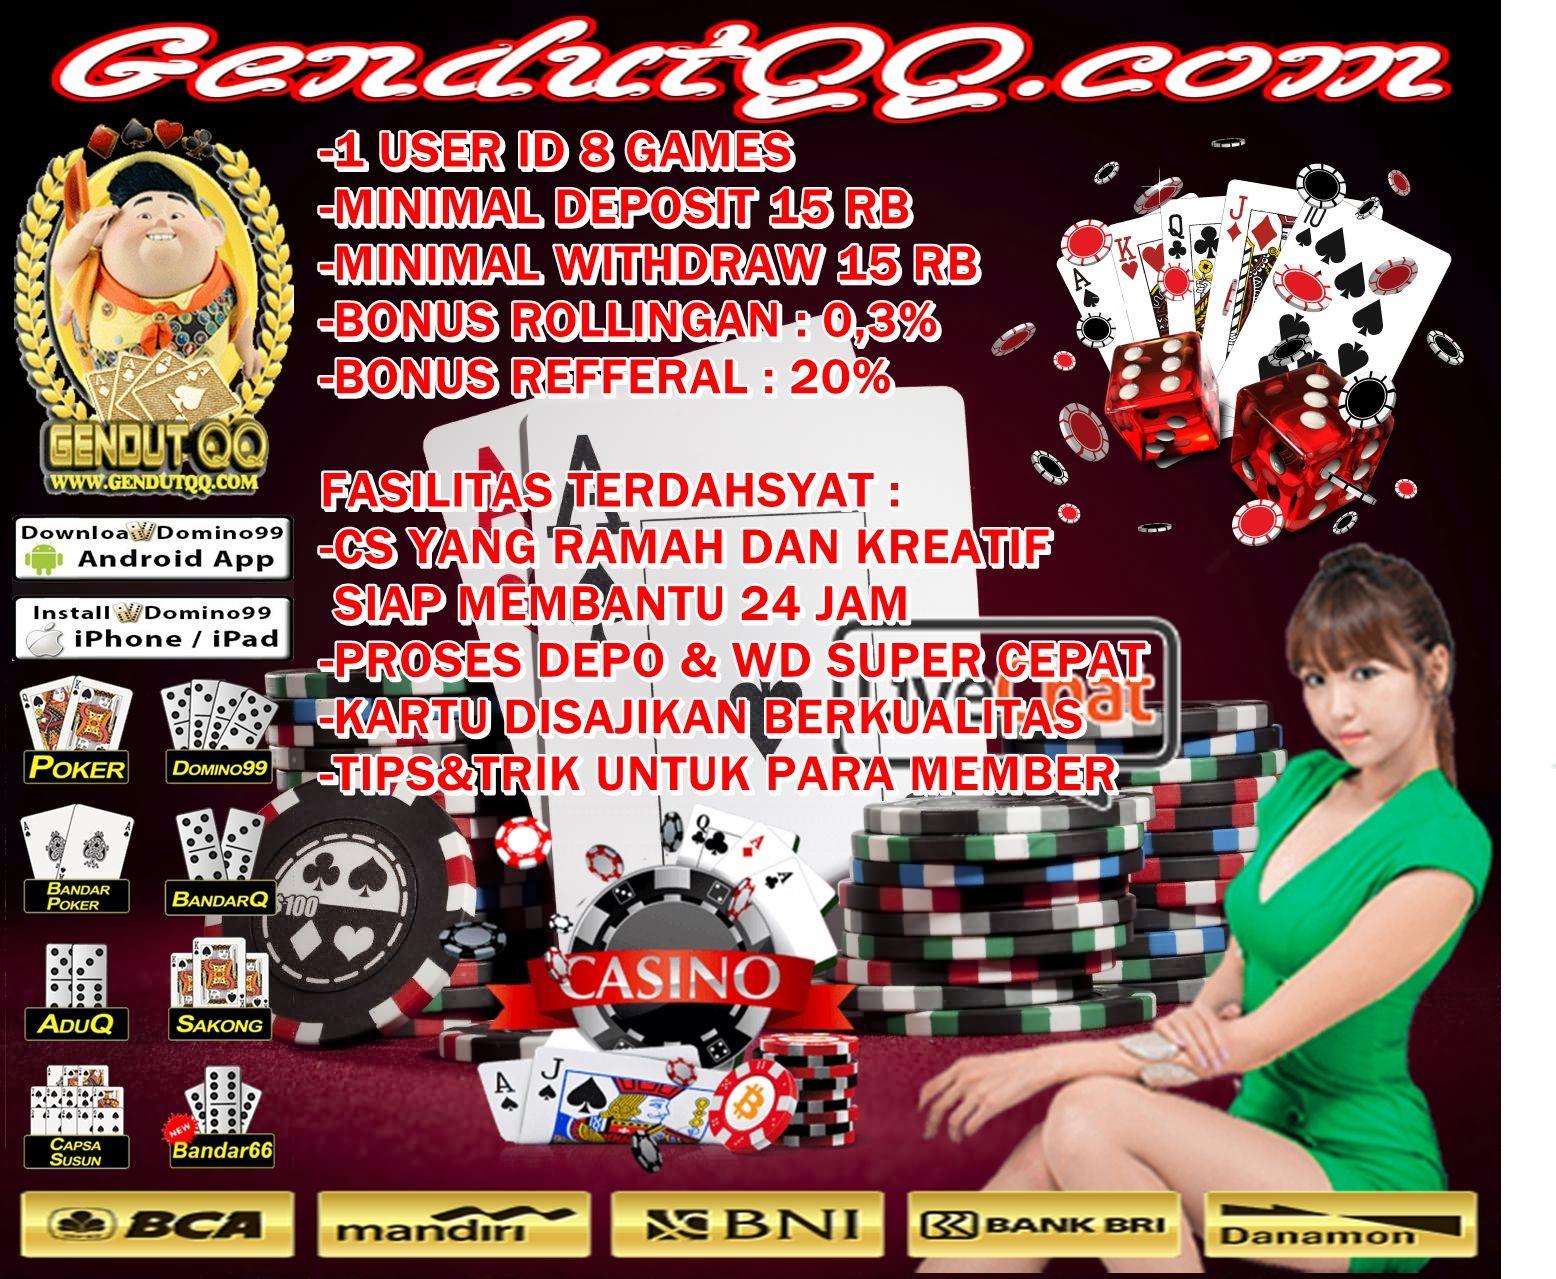 Pokerpelangi Indoqq Pelangiqq Ituqq Ahliqq Asikqq Indoqq Dominoqq Domino99 Dominokiukiu Dominoonline Pokeronline Kartu Iphone Poker